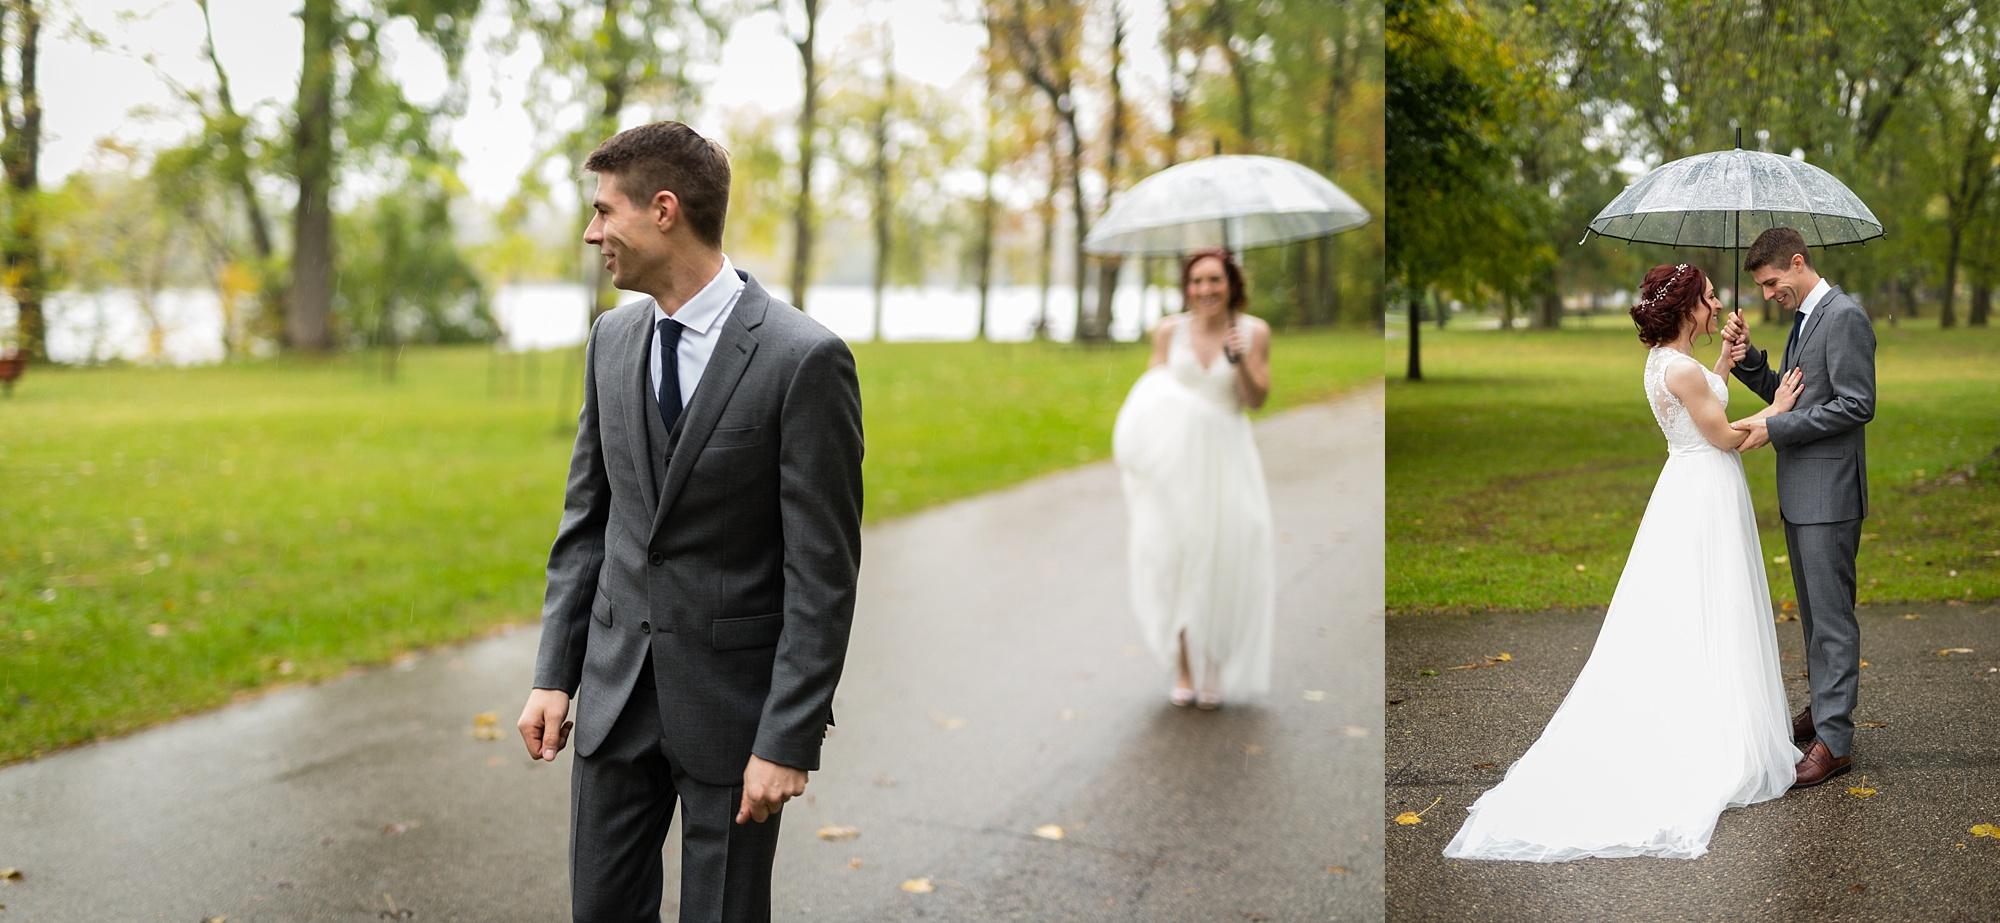 Brandon_Shafer_Photography_Lauren_Ethan_New_Vintage_Place_Grand_Rapids_Wedding_0019.jpg